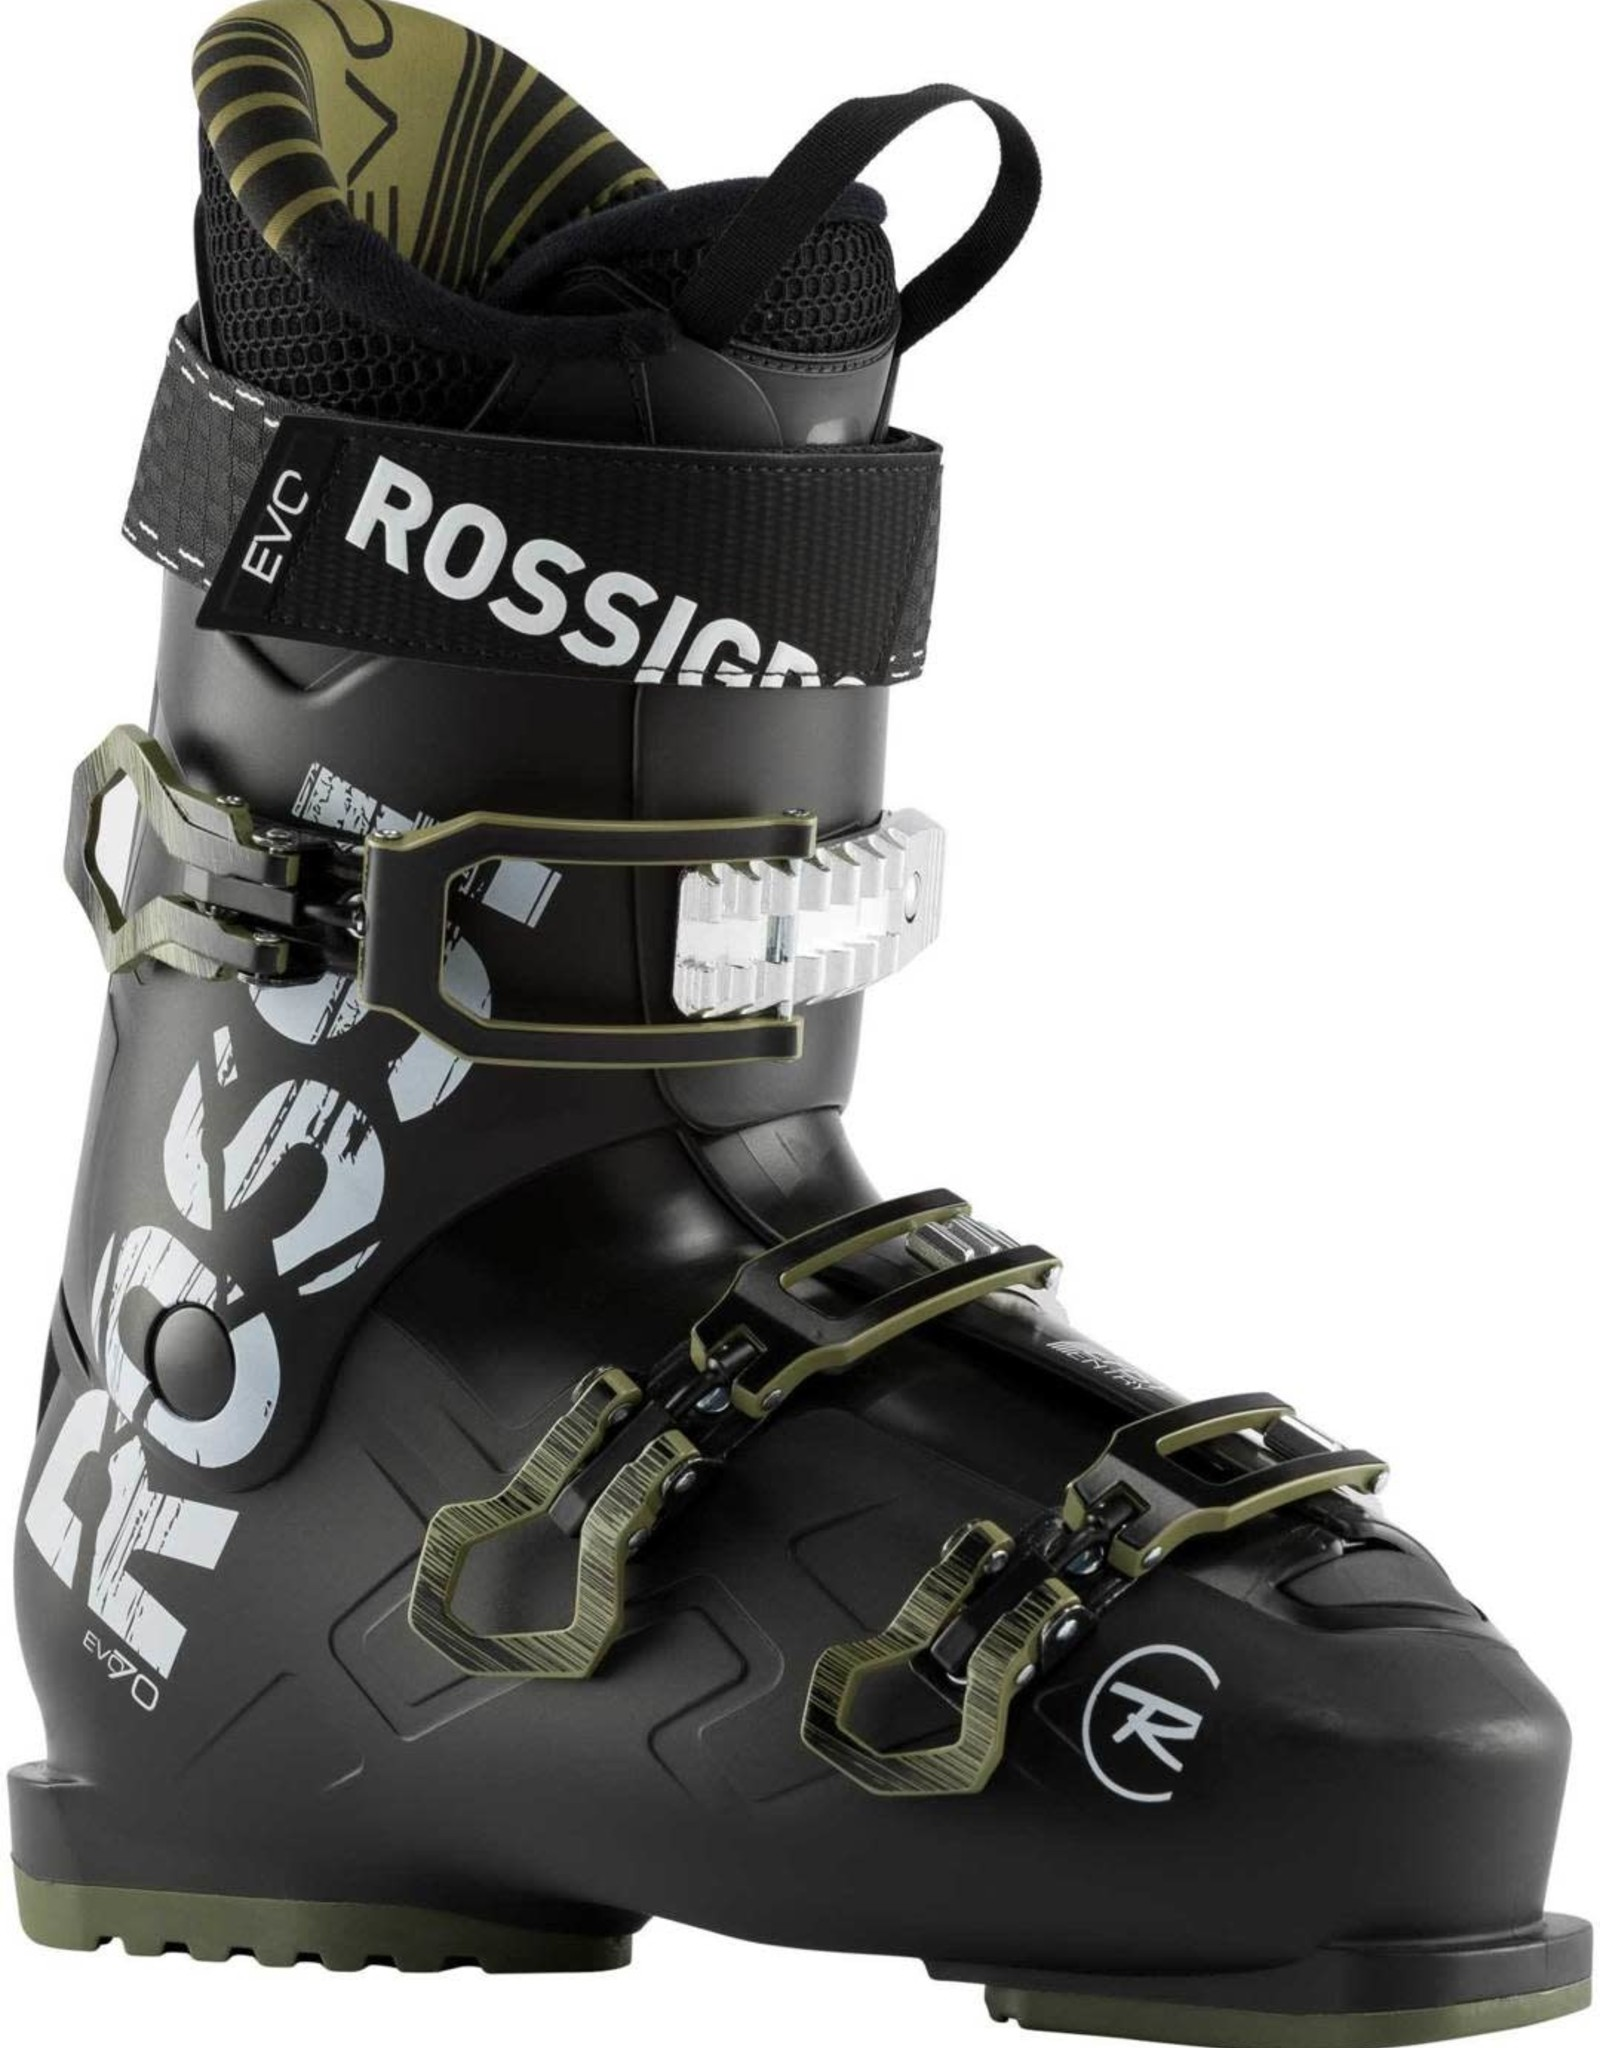 Rossignol Rossignol - EVO 70 - Blk/Khak -